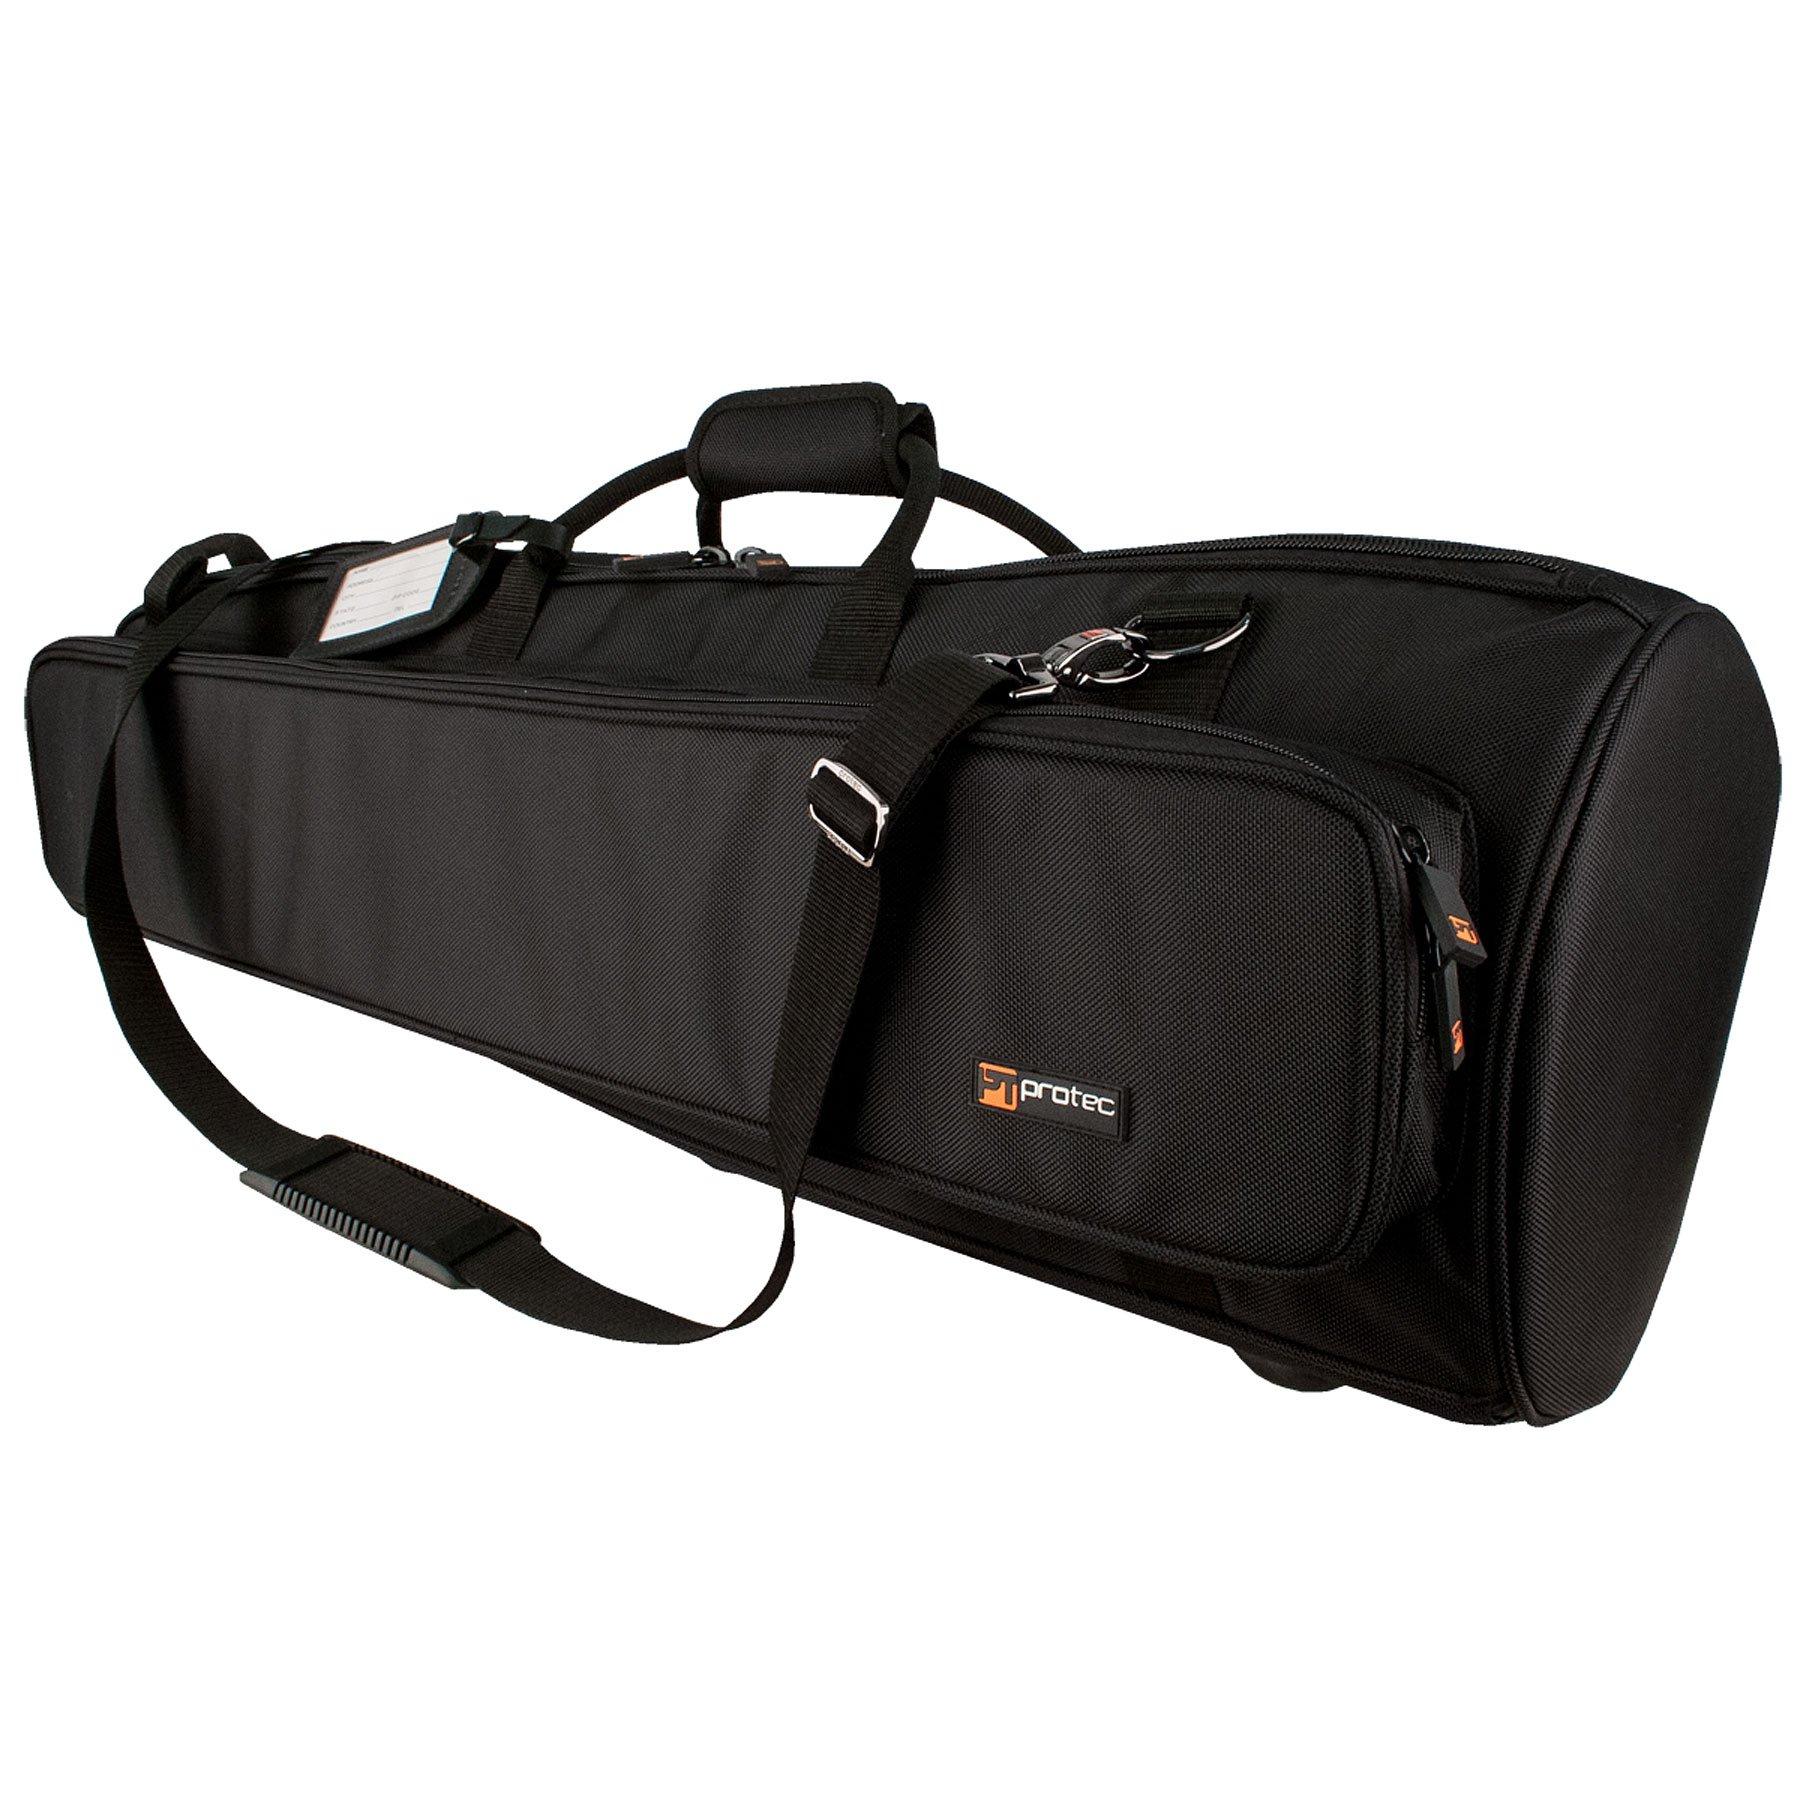 Protec Bass Trombone Gig Bag, Gold Series, Model C245